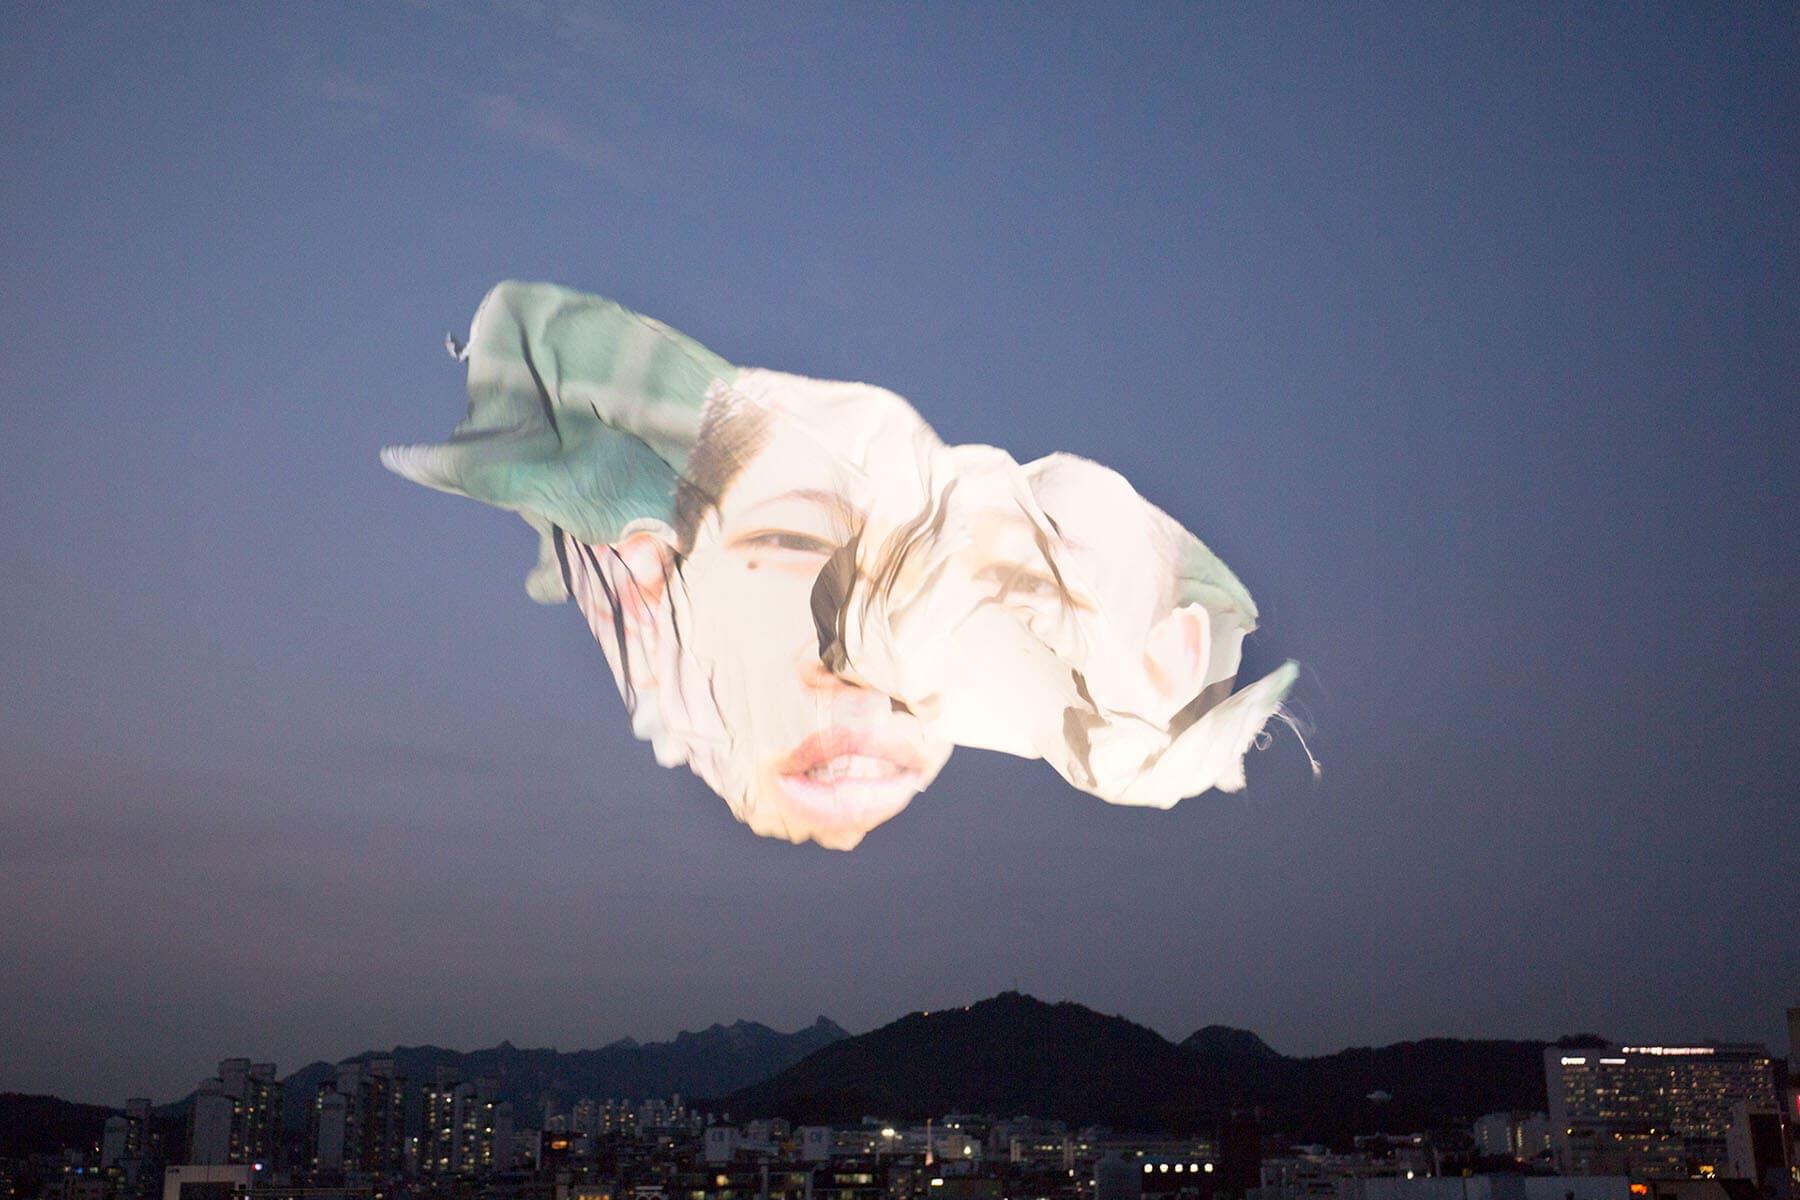 wonjun jeong fy 9